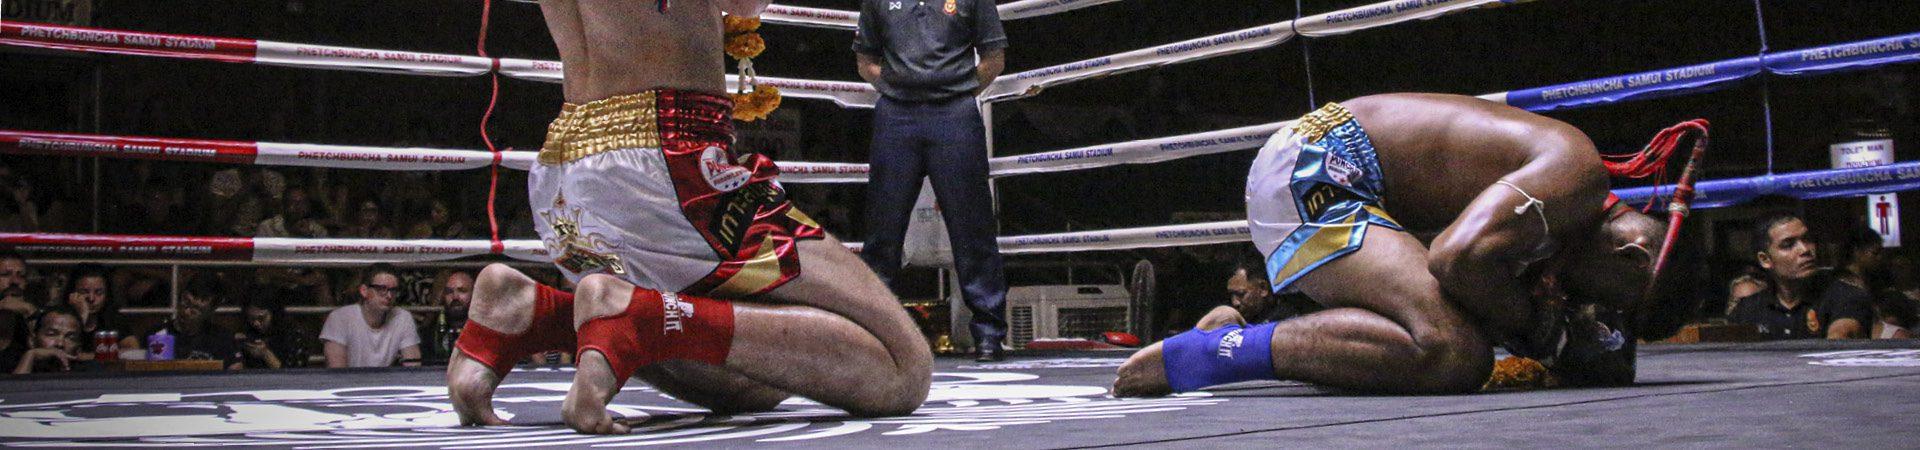 New Comer Challenge - Muay Thai Thailand